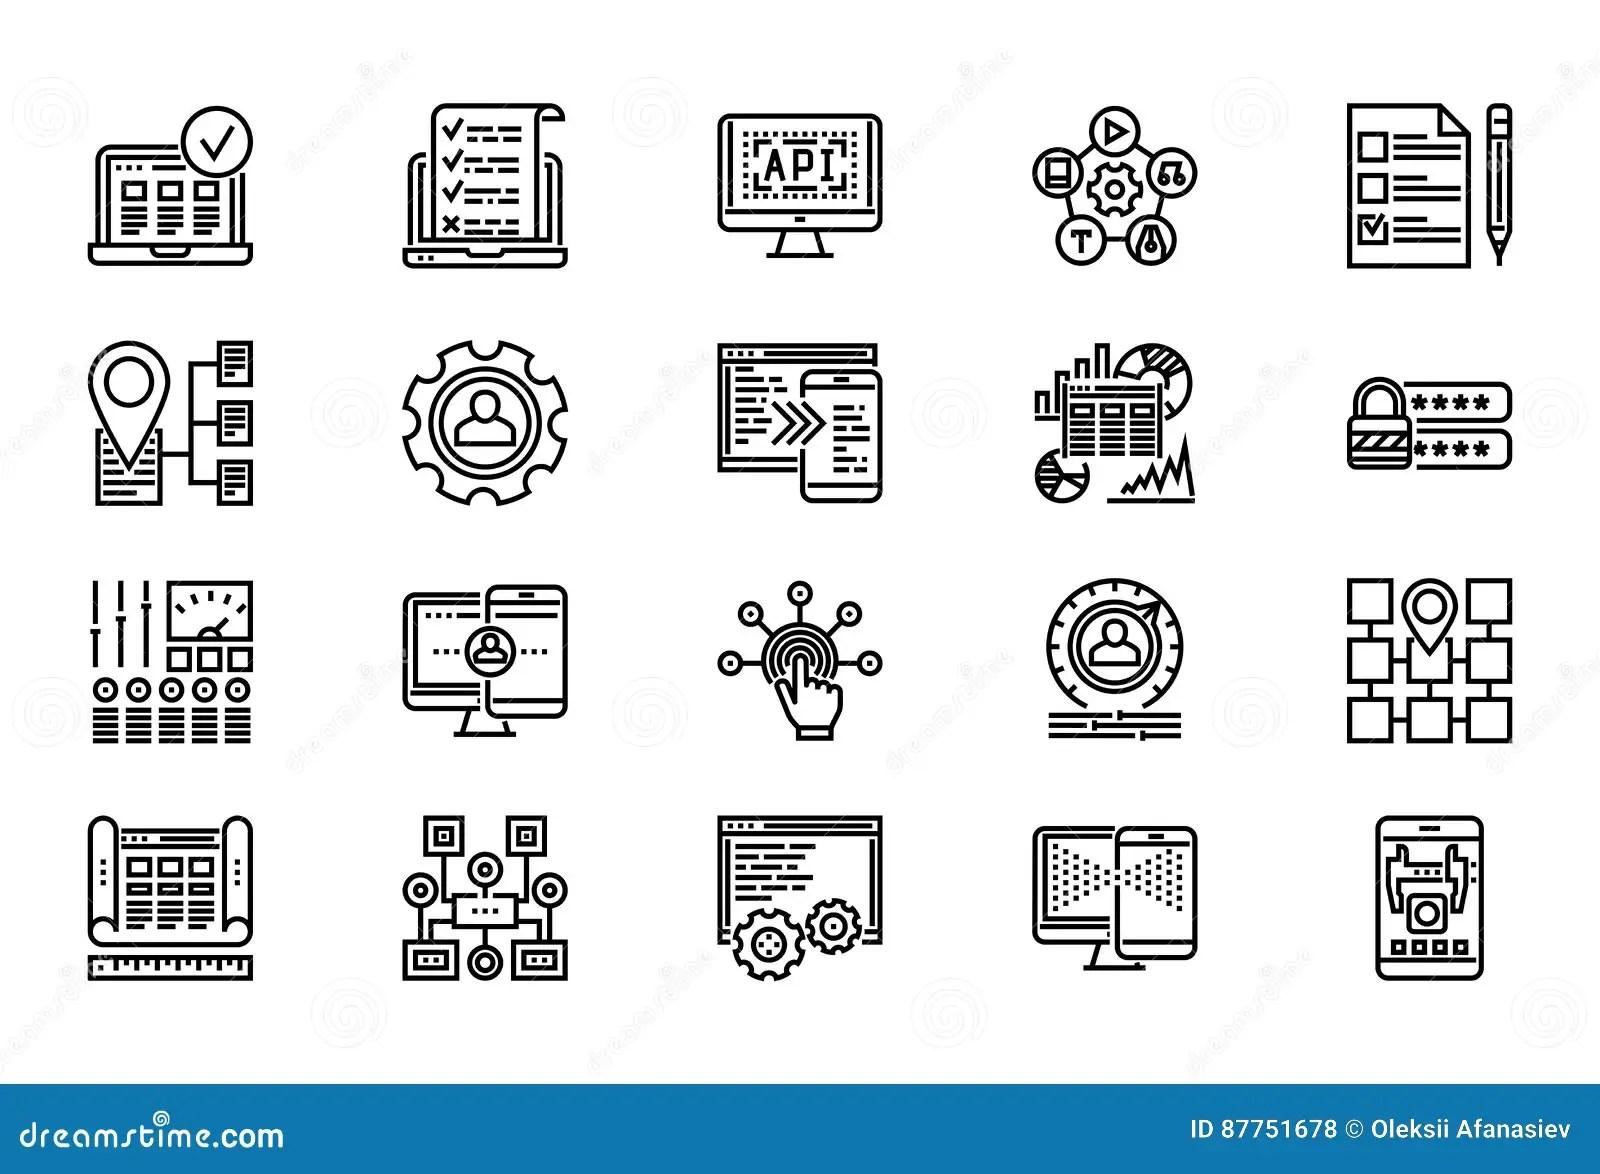 Simple Algorithm Stock Image